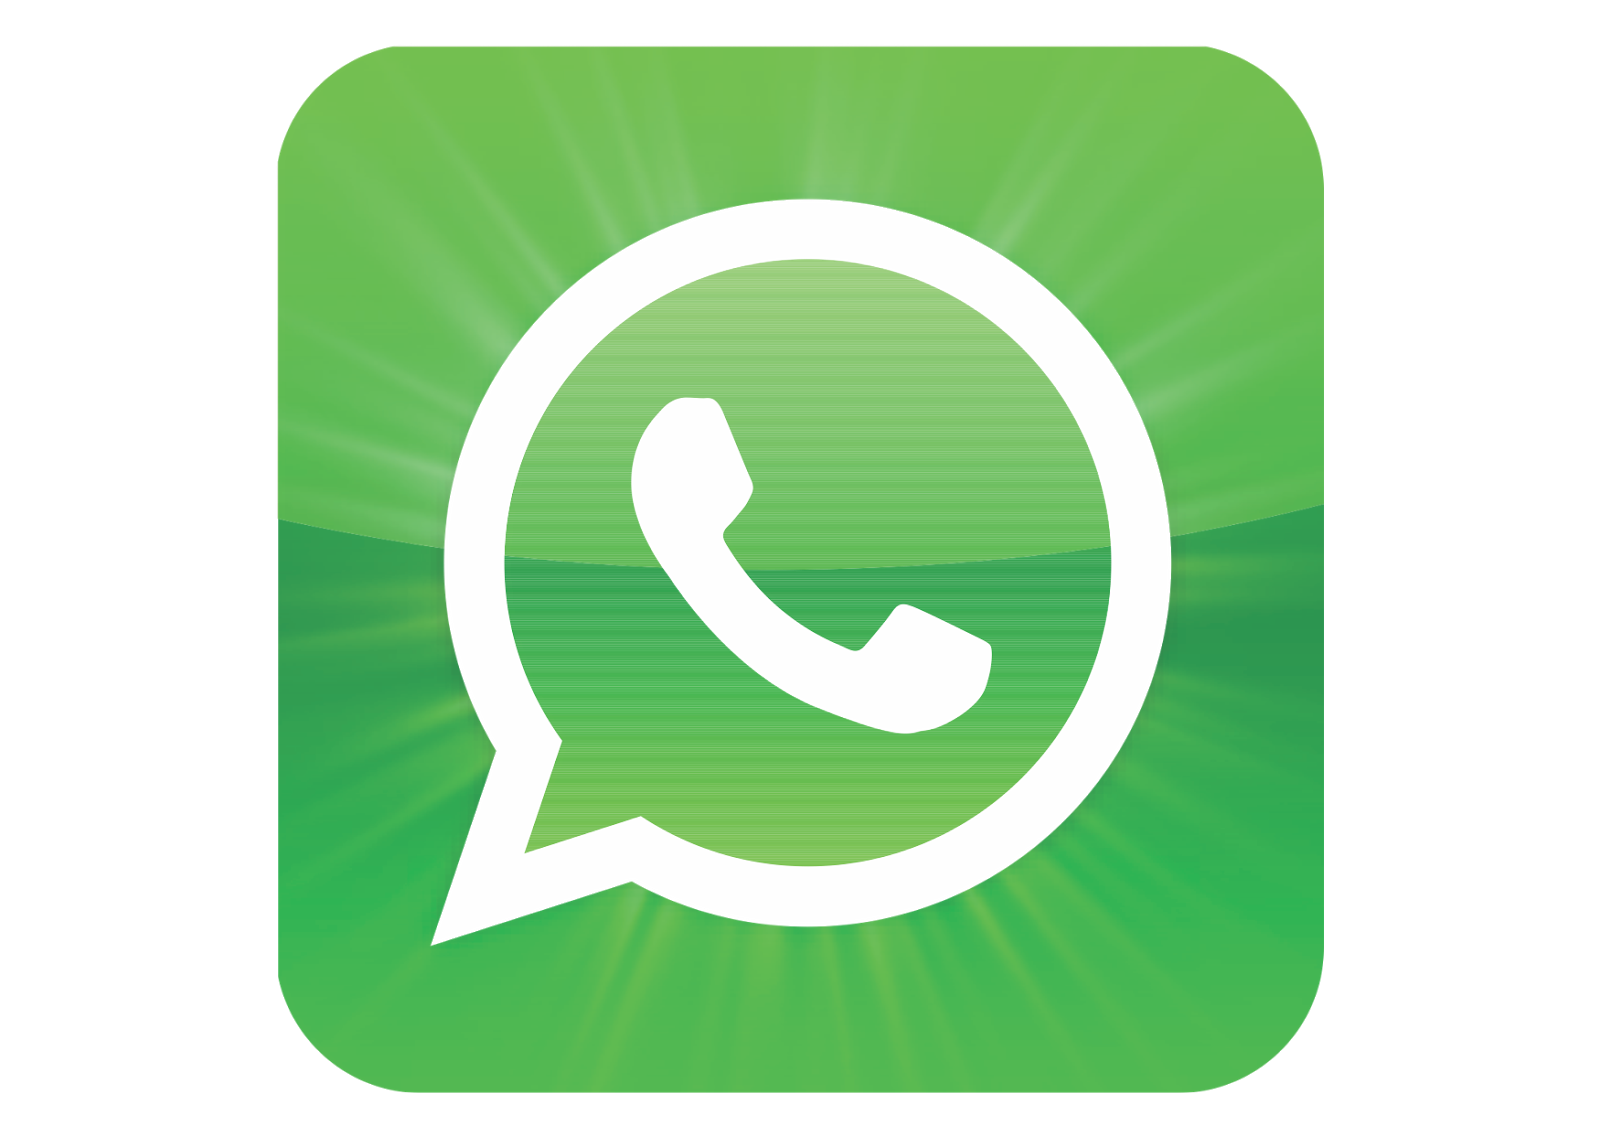 Whatsapp png images free. Facebook clipart emblem